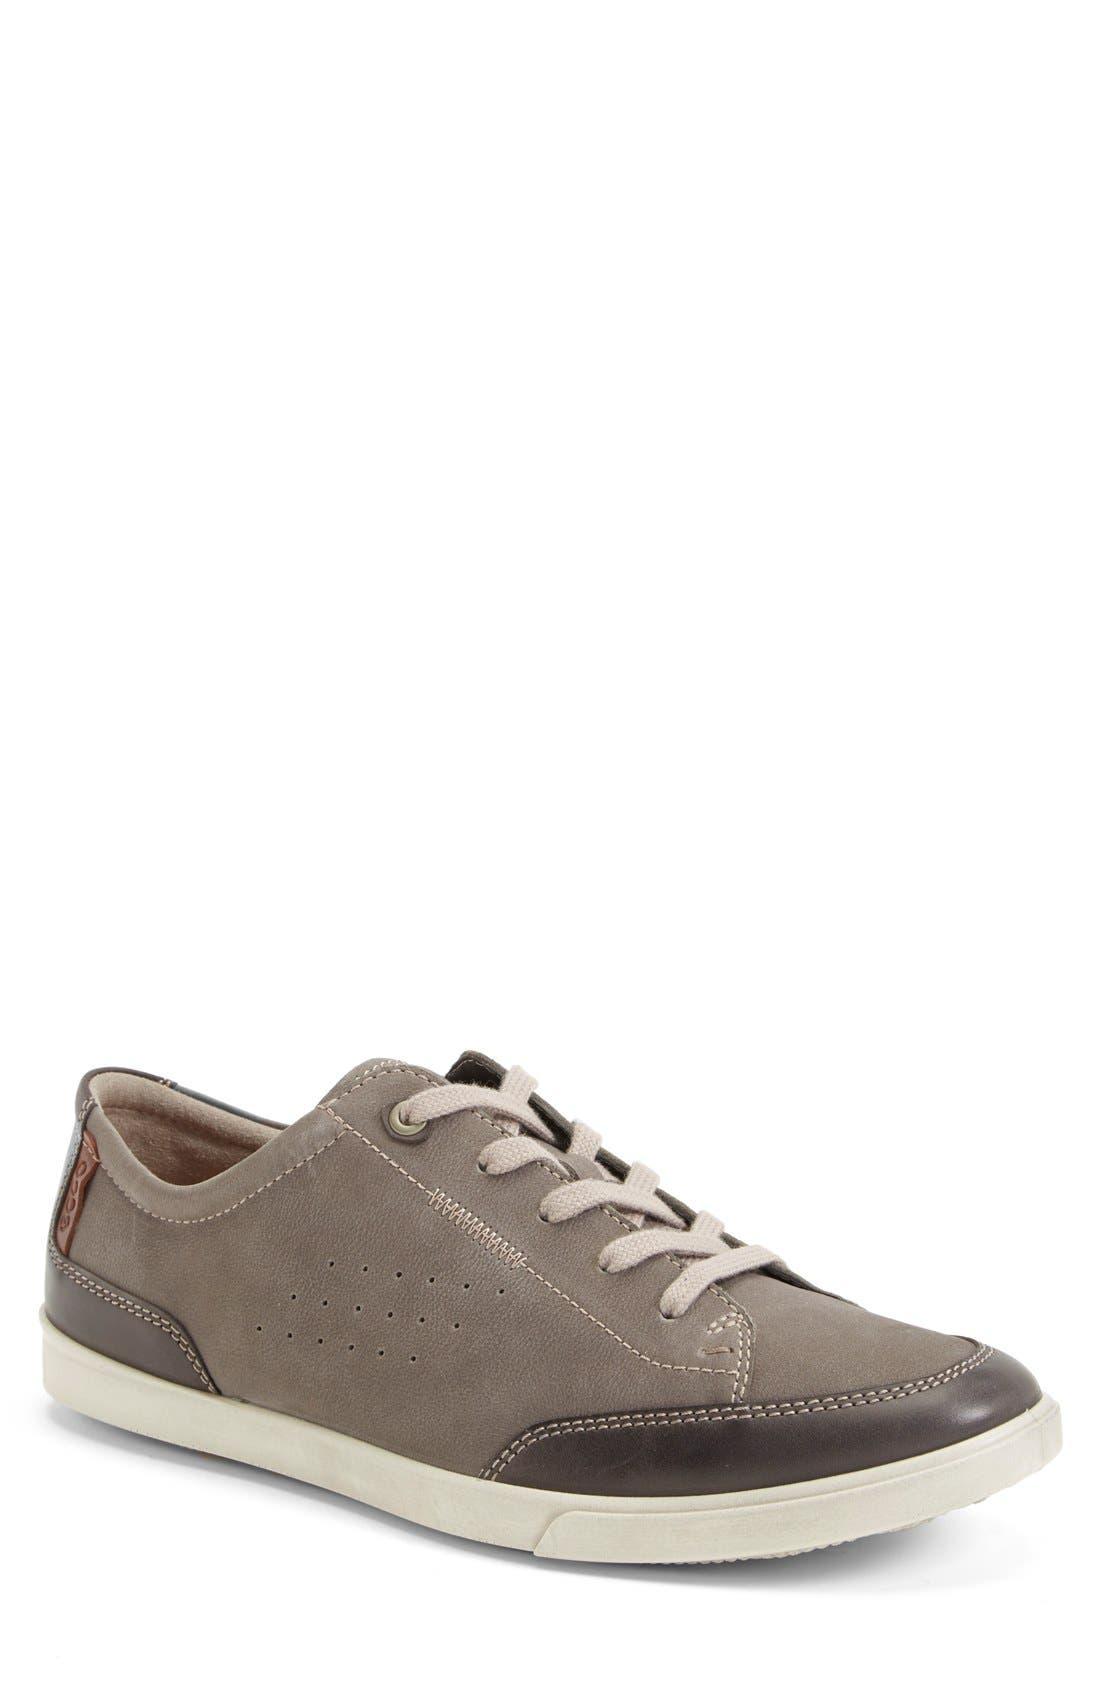 Main Image - ECCO 'Collin' Sneaker (Men)